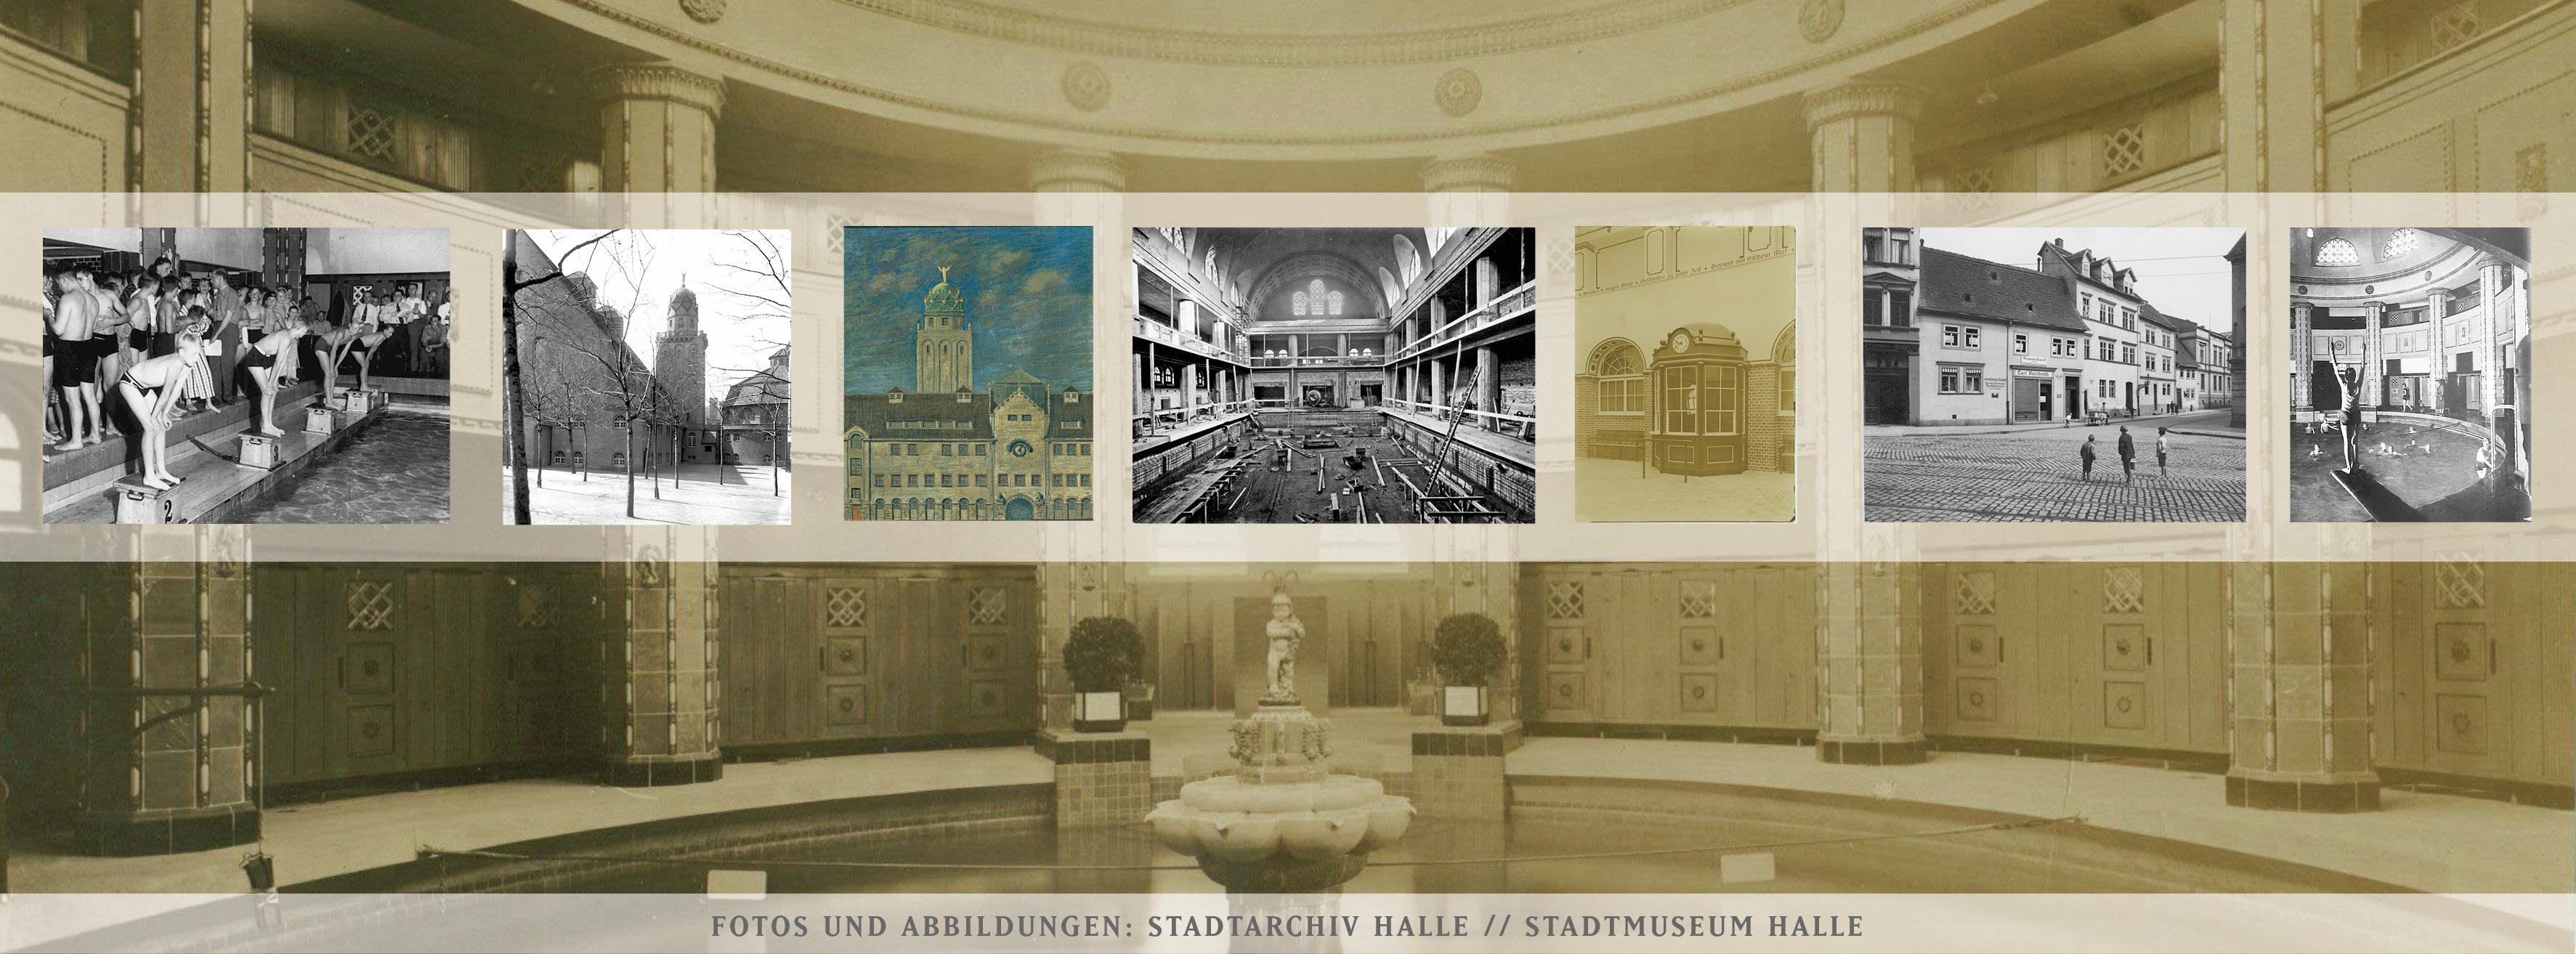 Fotos: Stadtarchiv Halle // Stadtmuseum Halle